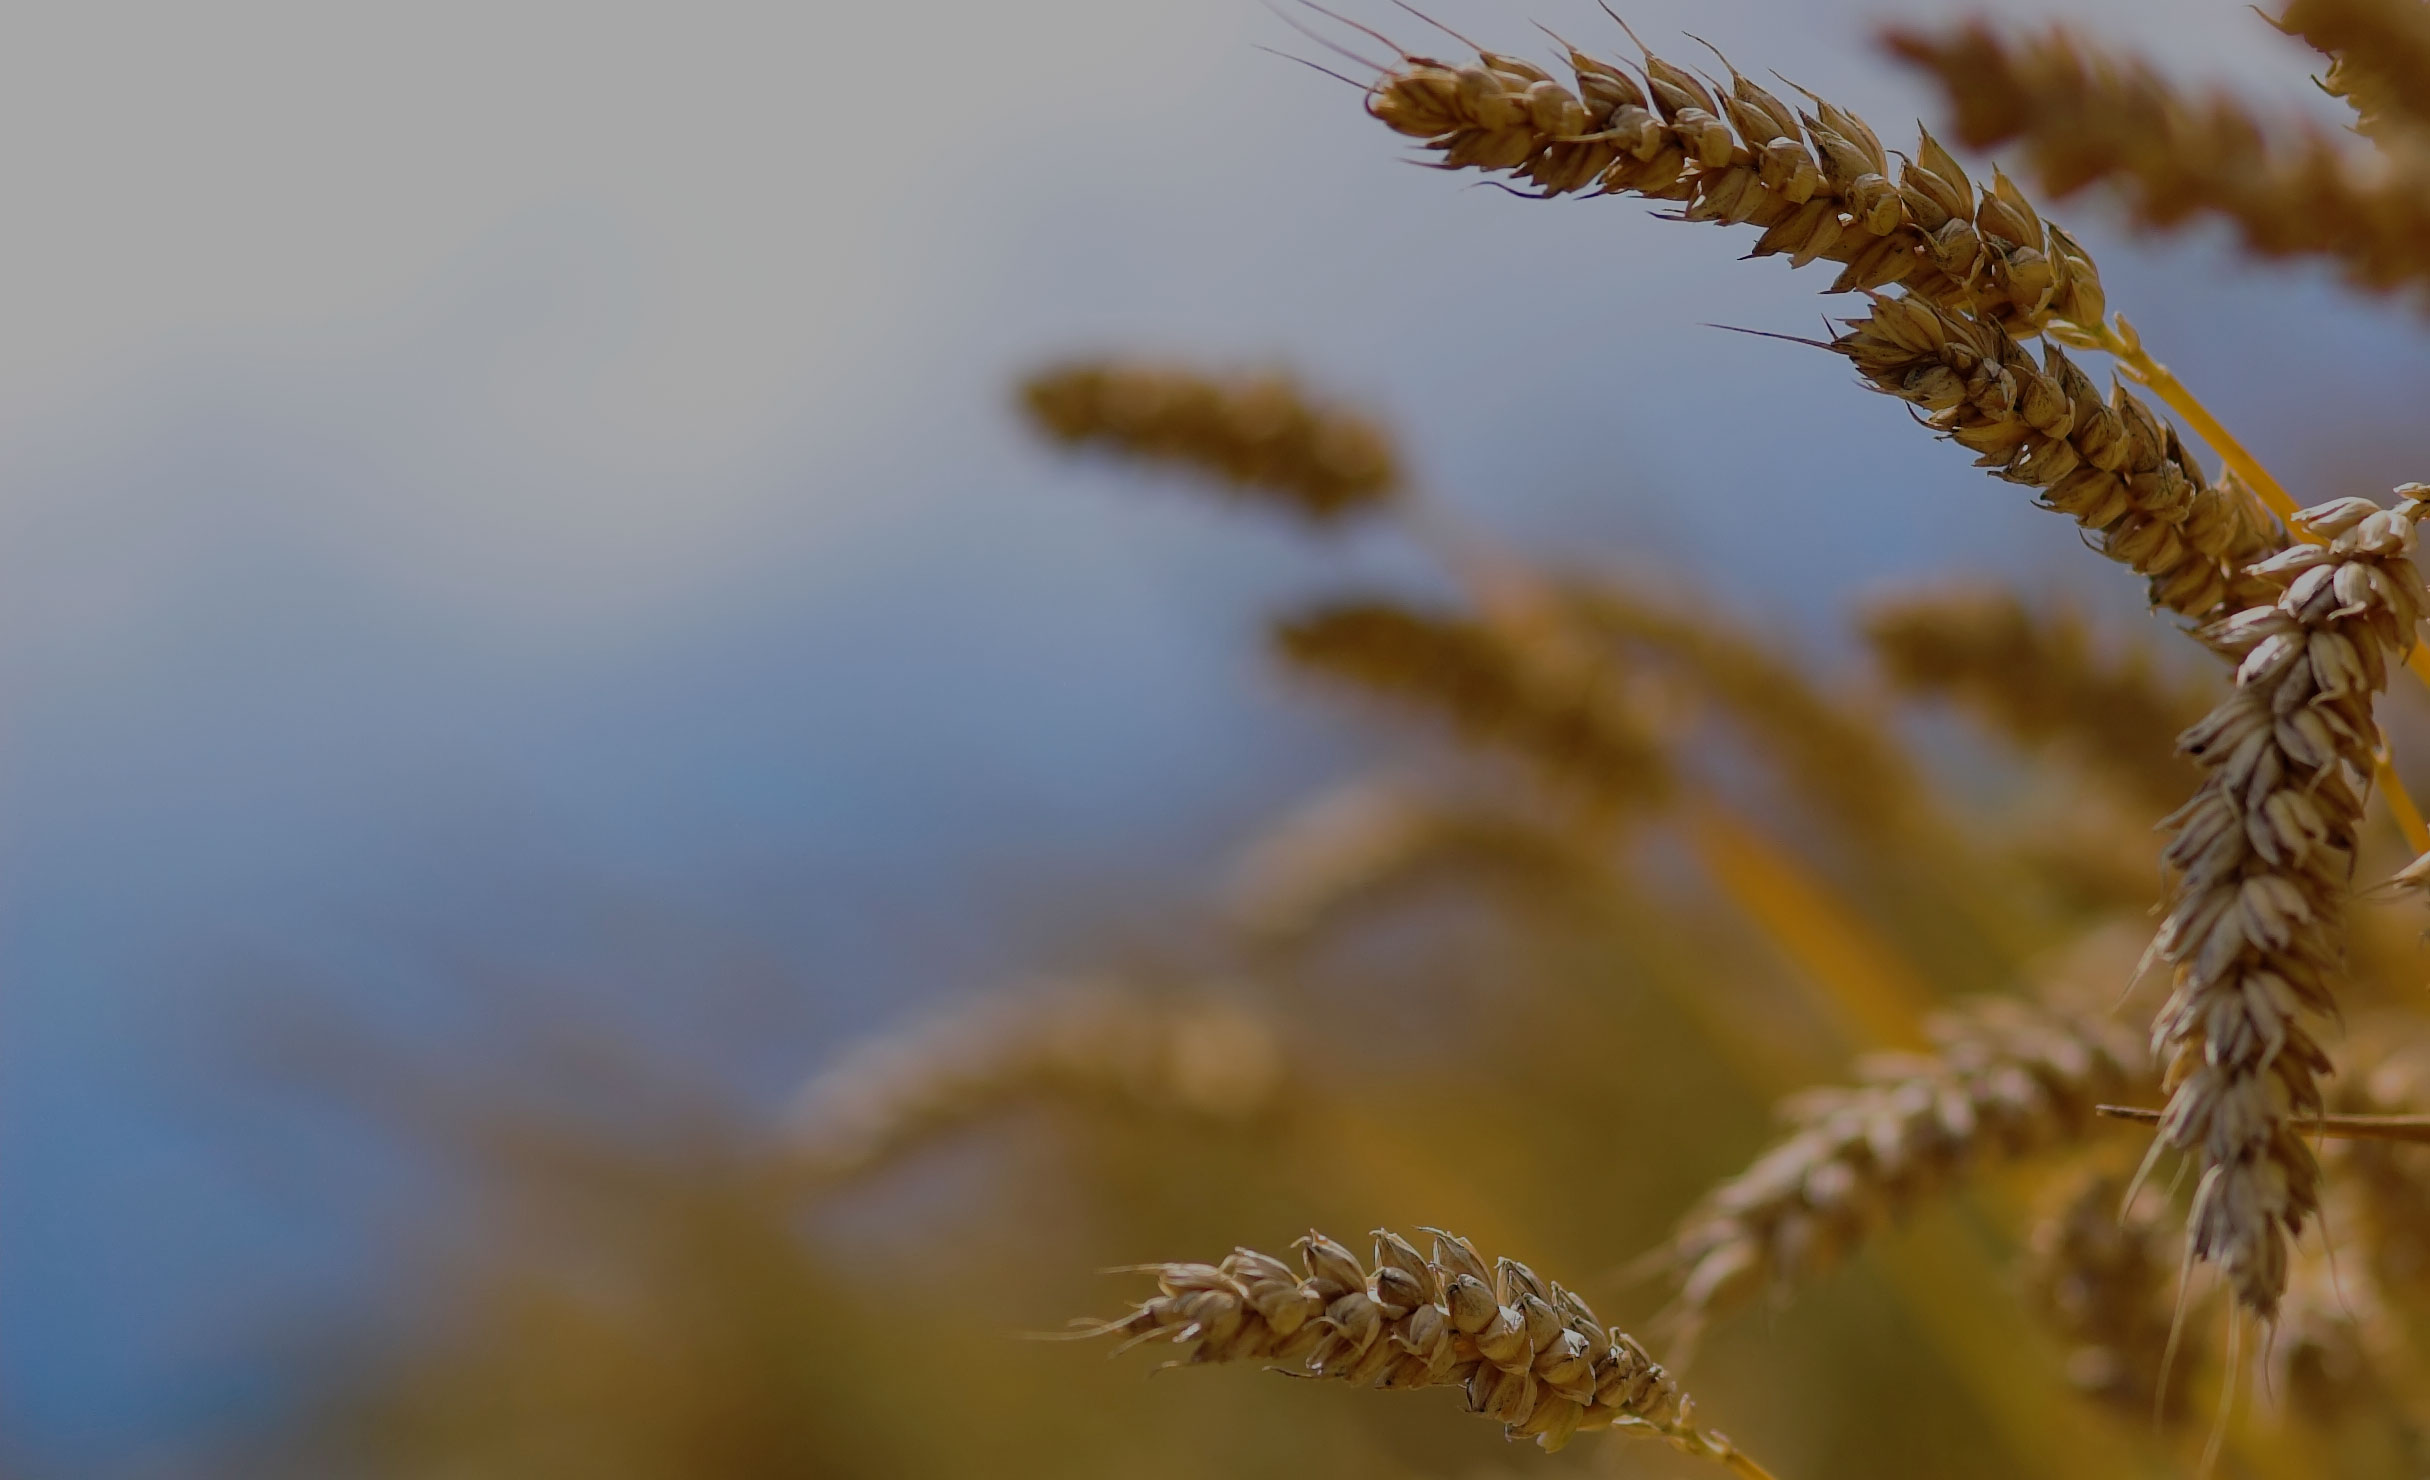 iStock_000003825445Mediumwheat